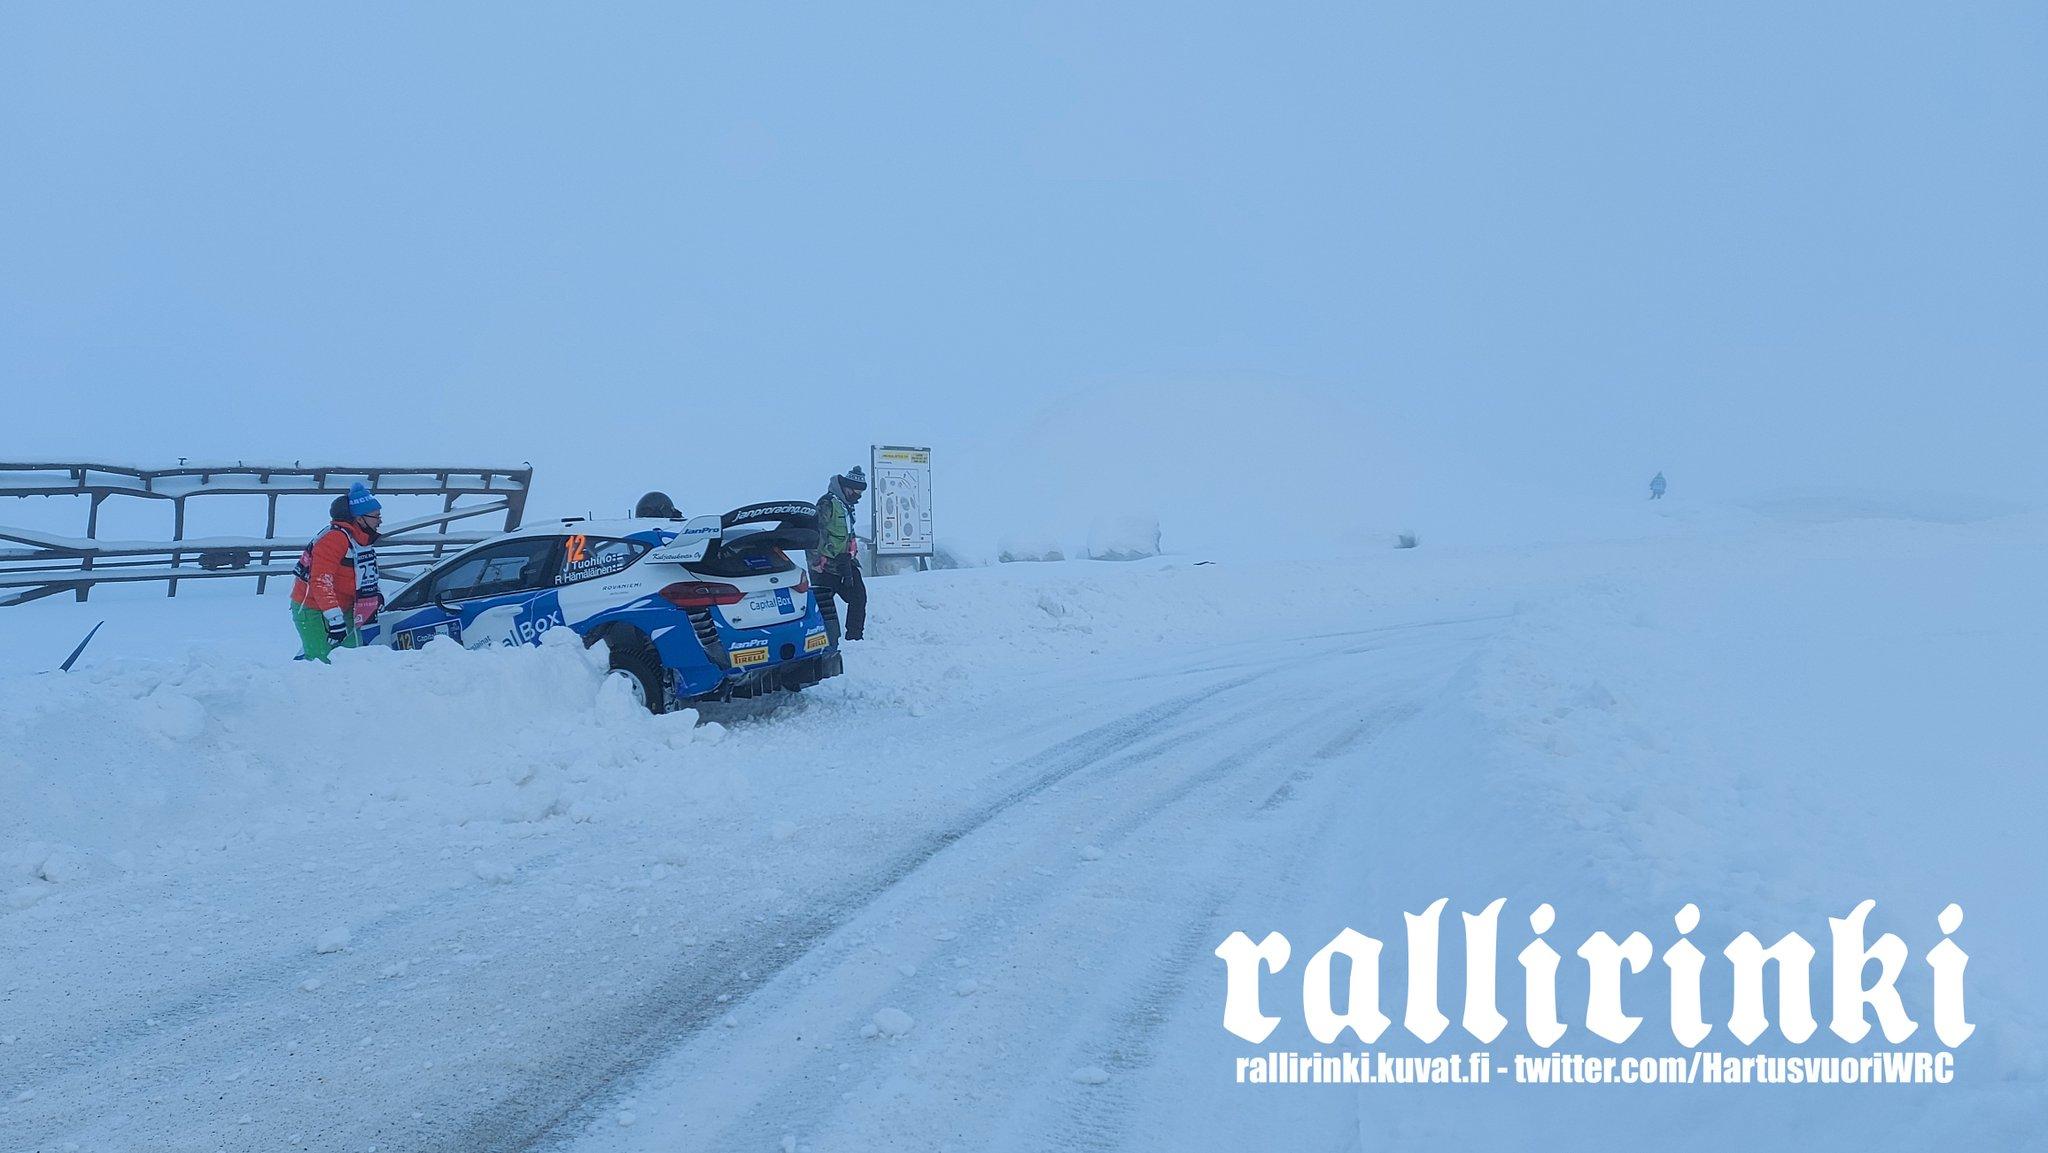 WRC: Arctic Rally Finland - Powered by CapitalBox [26-28 Febrero] - Página 2 EvImZctXUAIocwa?format=jpg&name=large